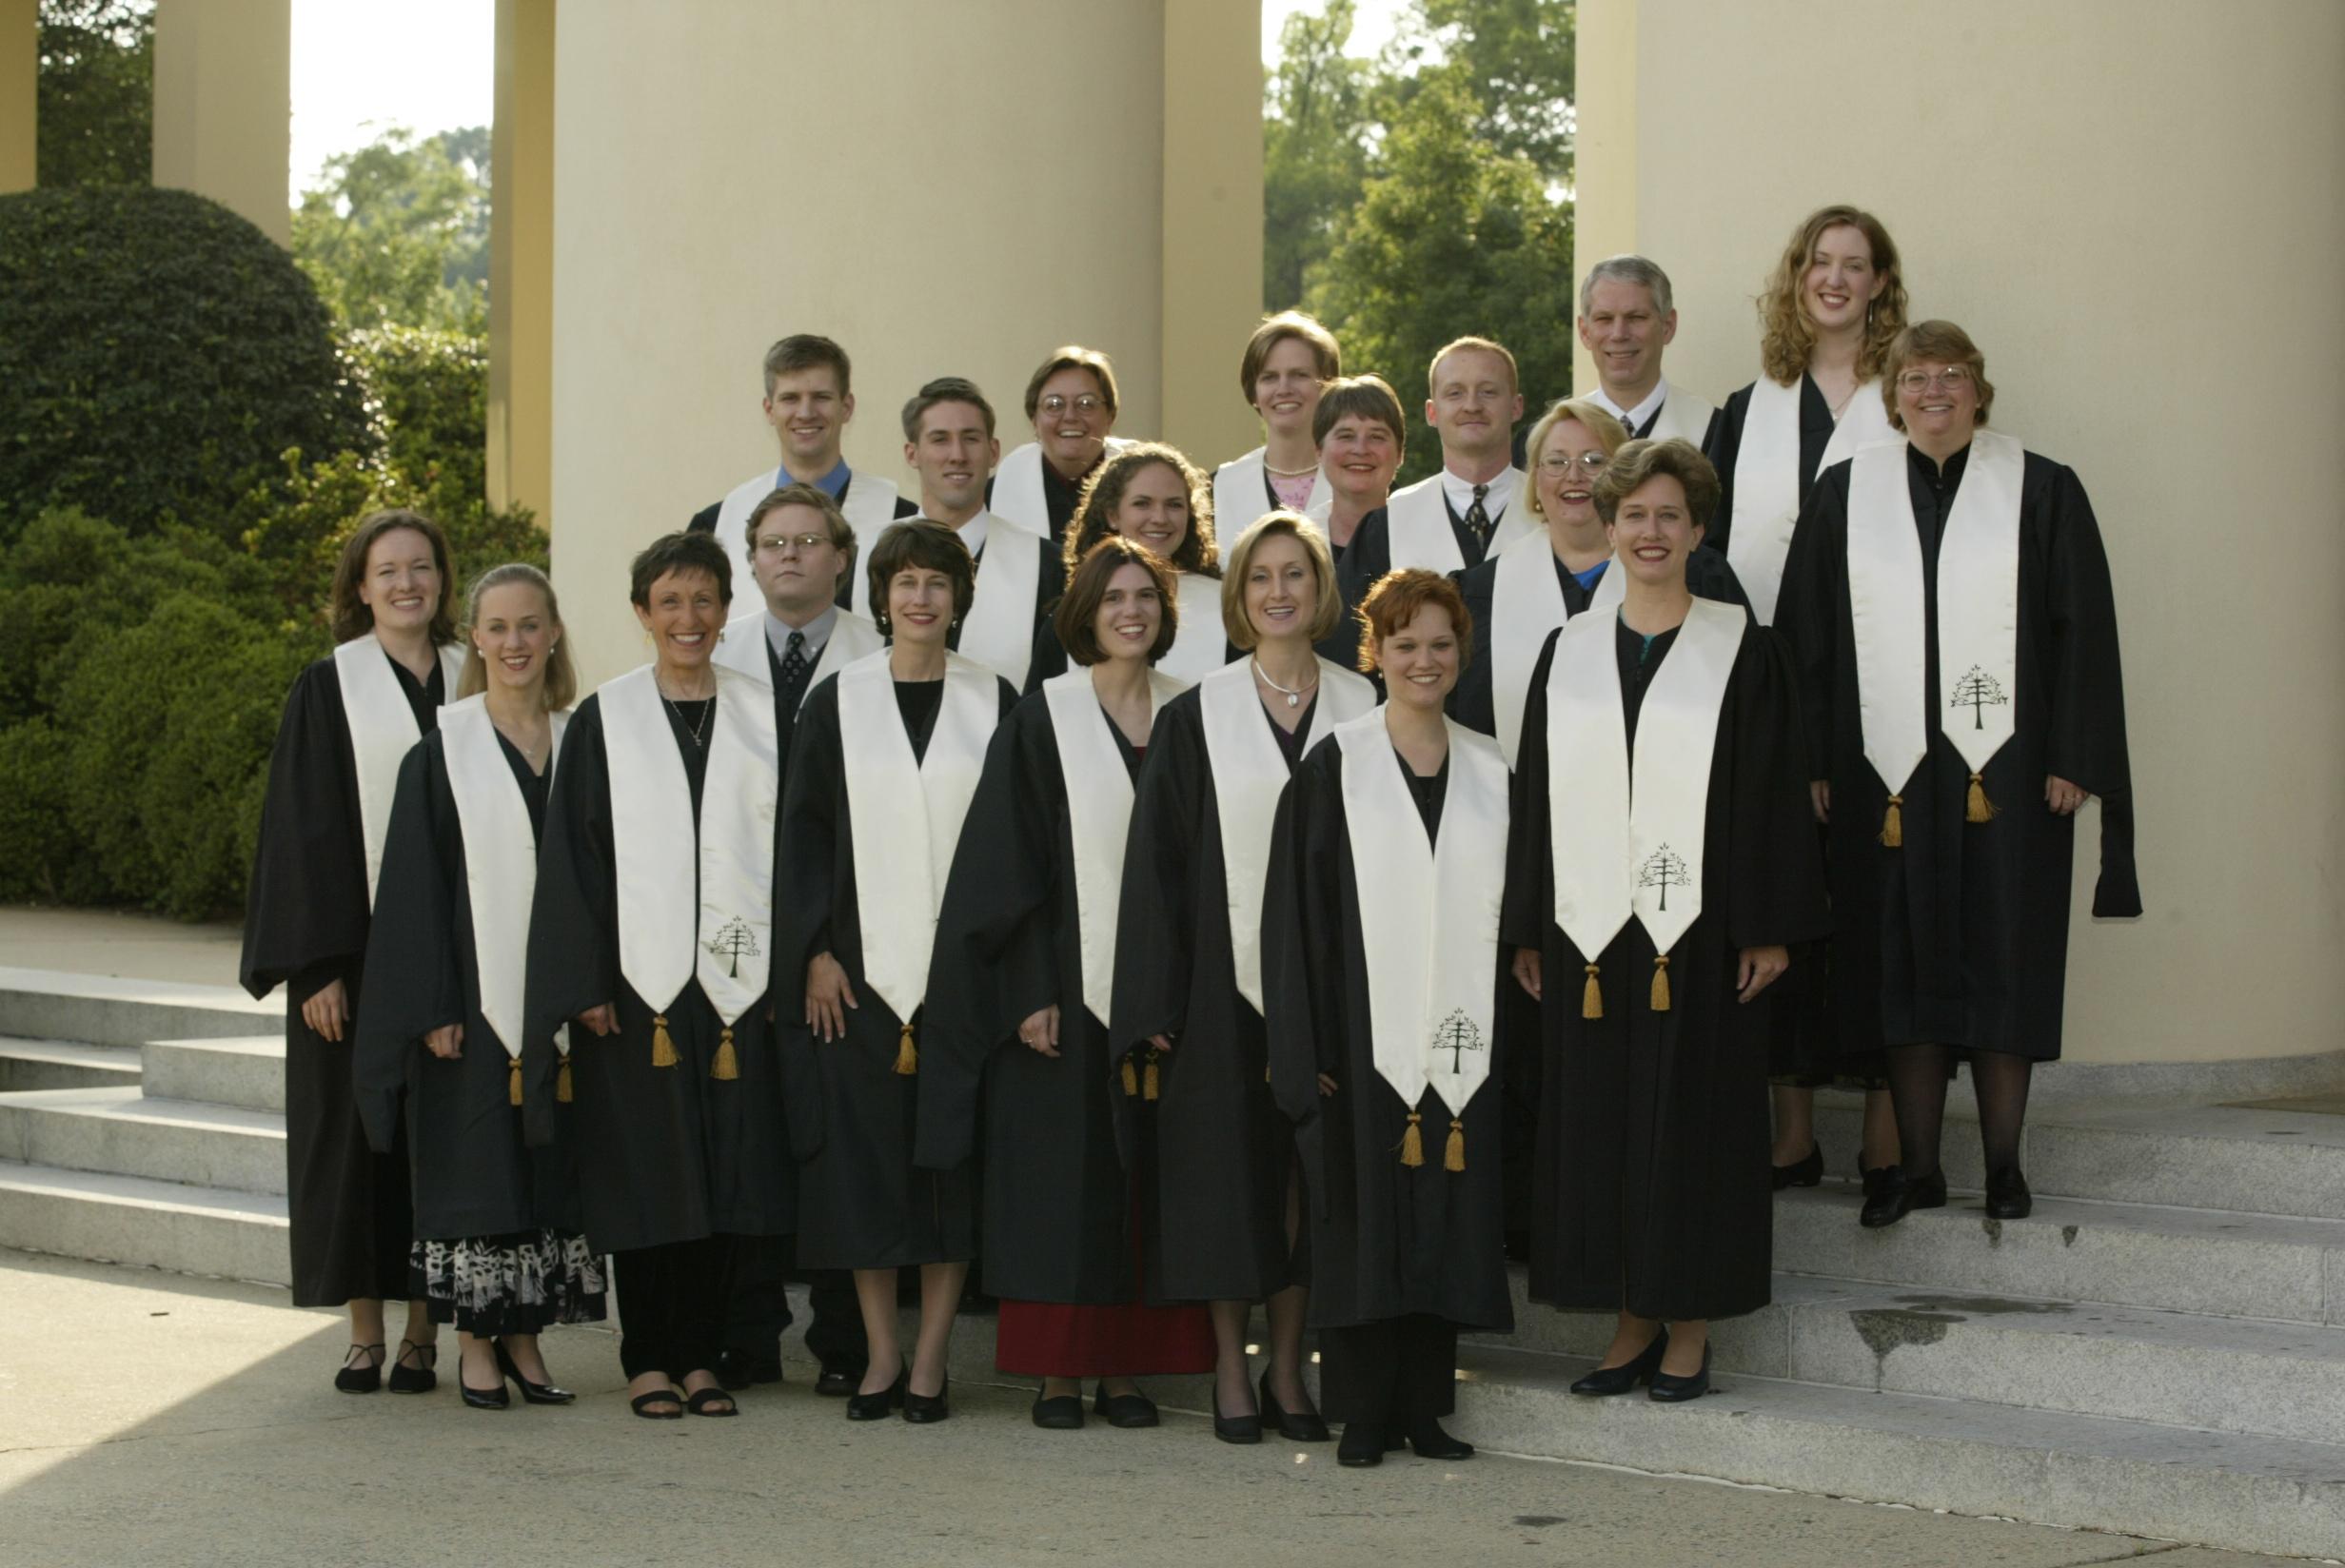 Inaugural Master of Divinity graduating class, 2002